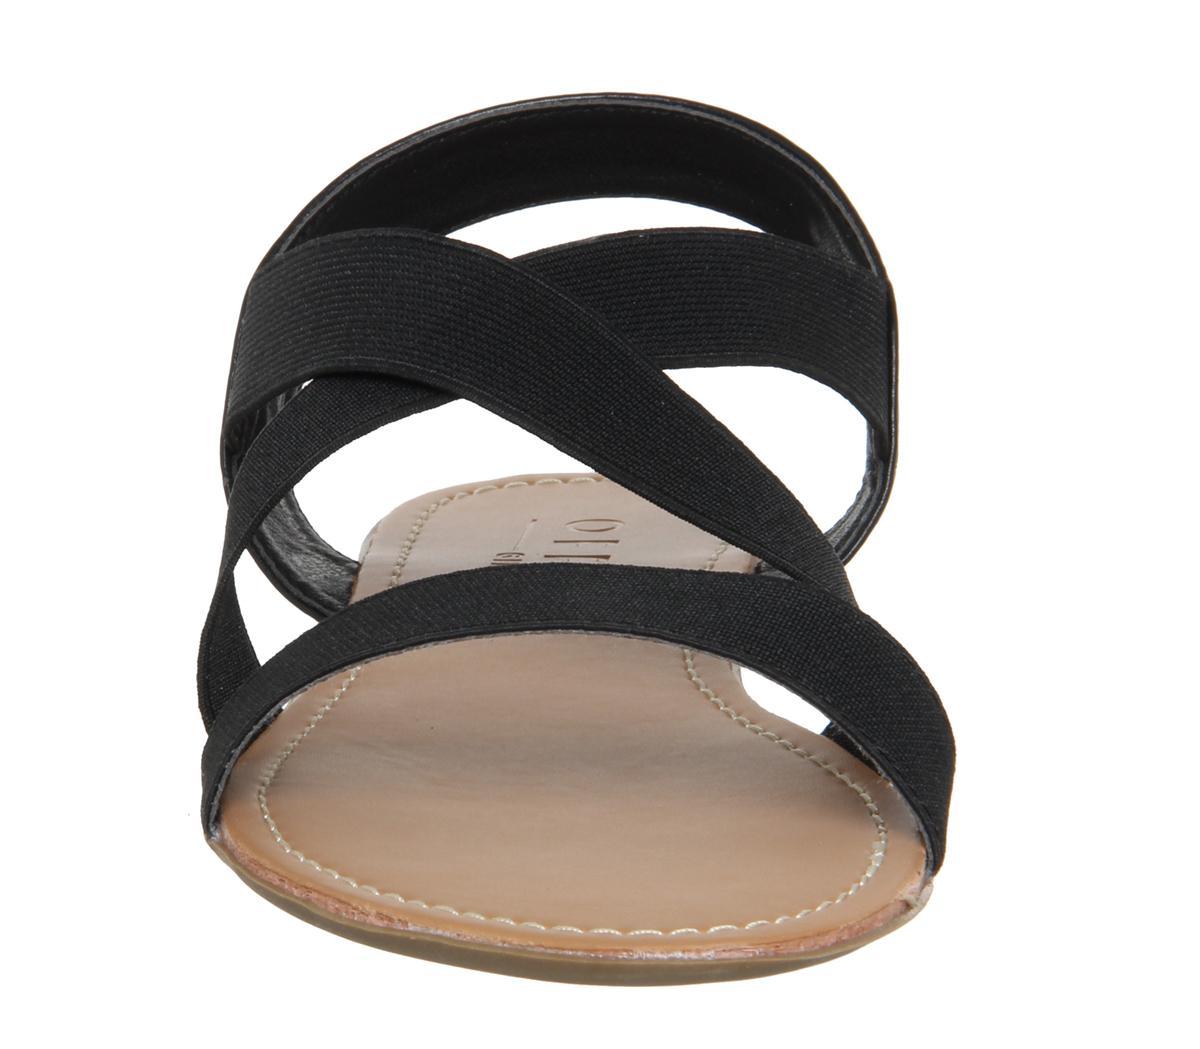 b93ff072f817 Office Orbit Elastic Strap Sandals in Black - Lyst